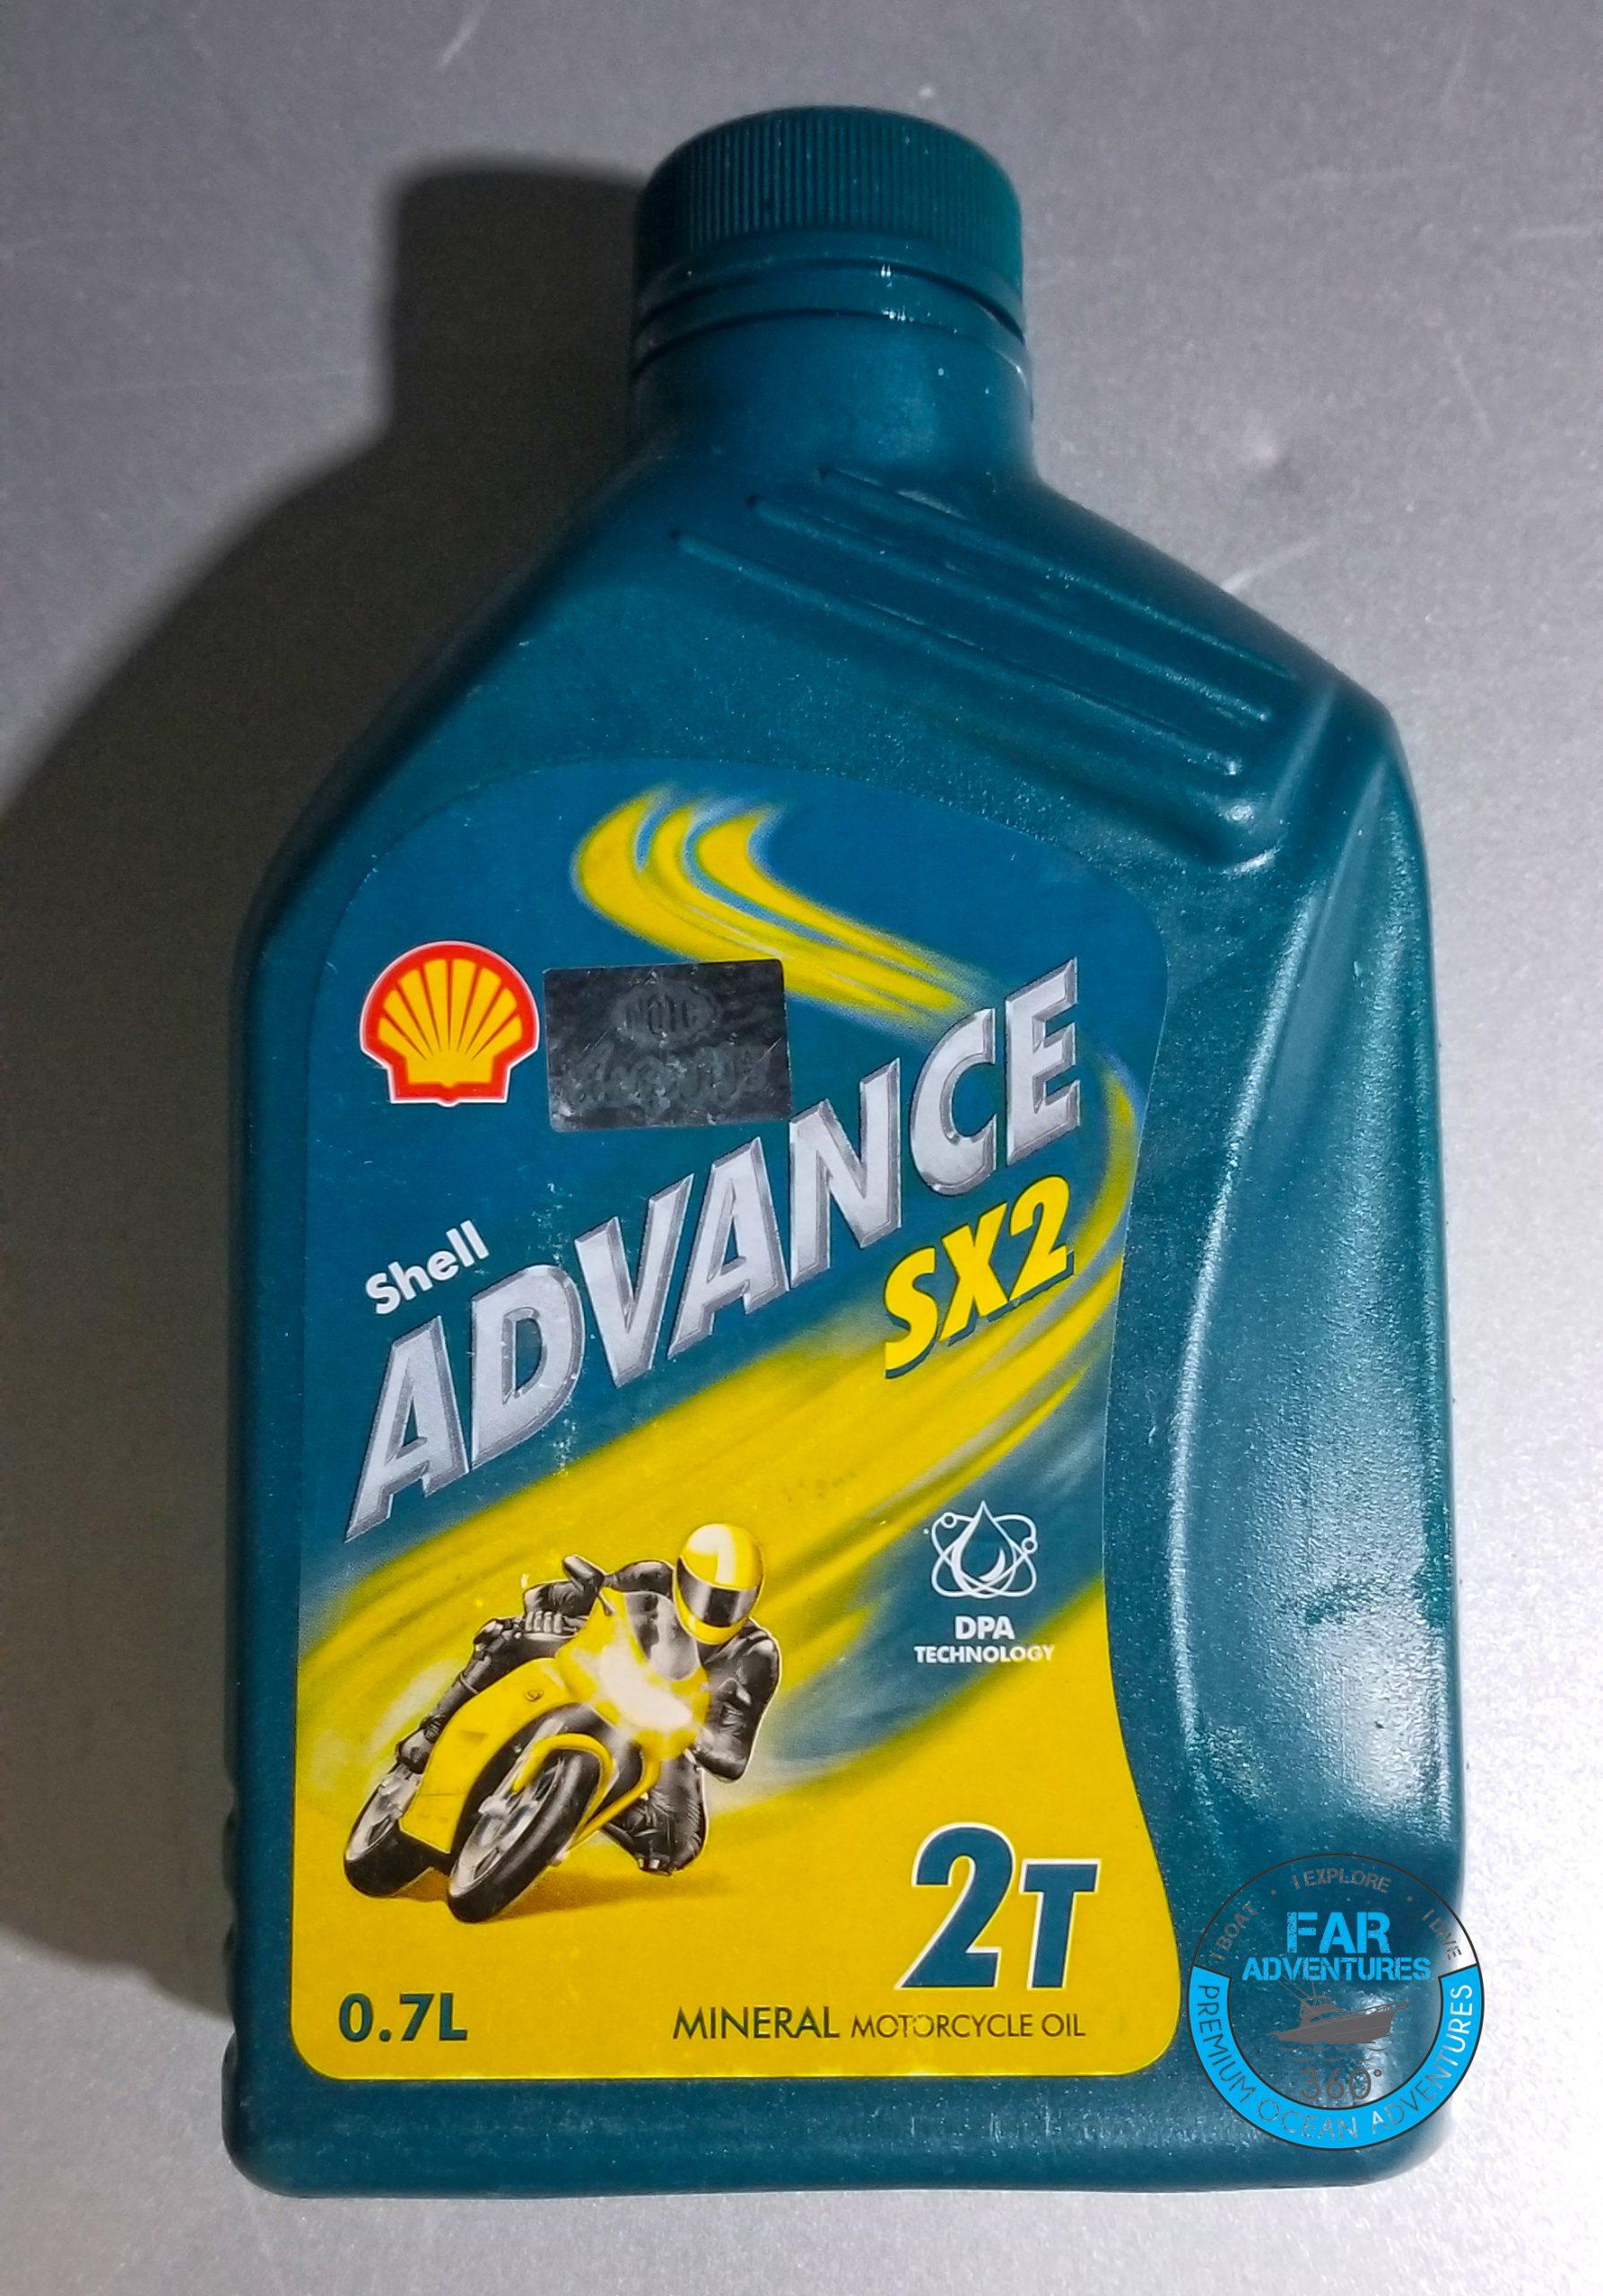 Shell Advance SX2 2T Marine Mineral Engine Oil